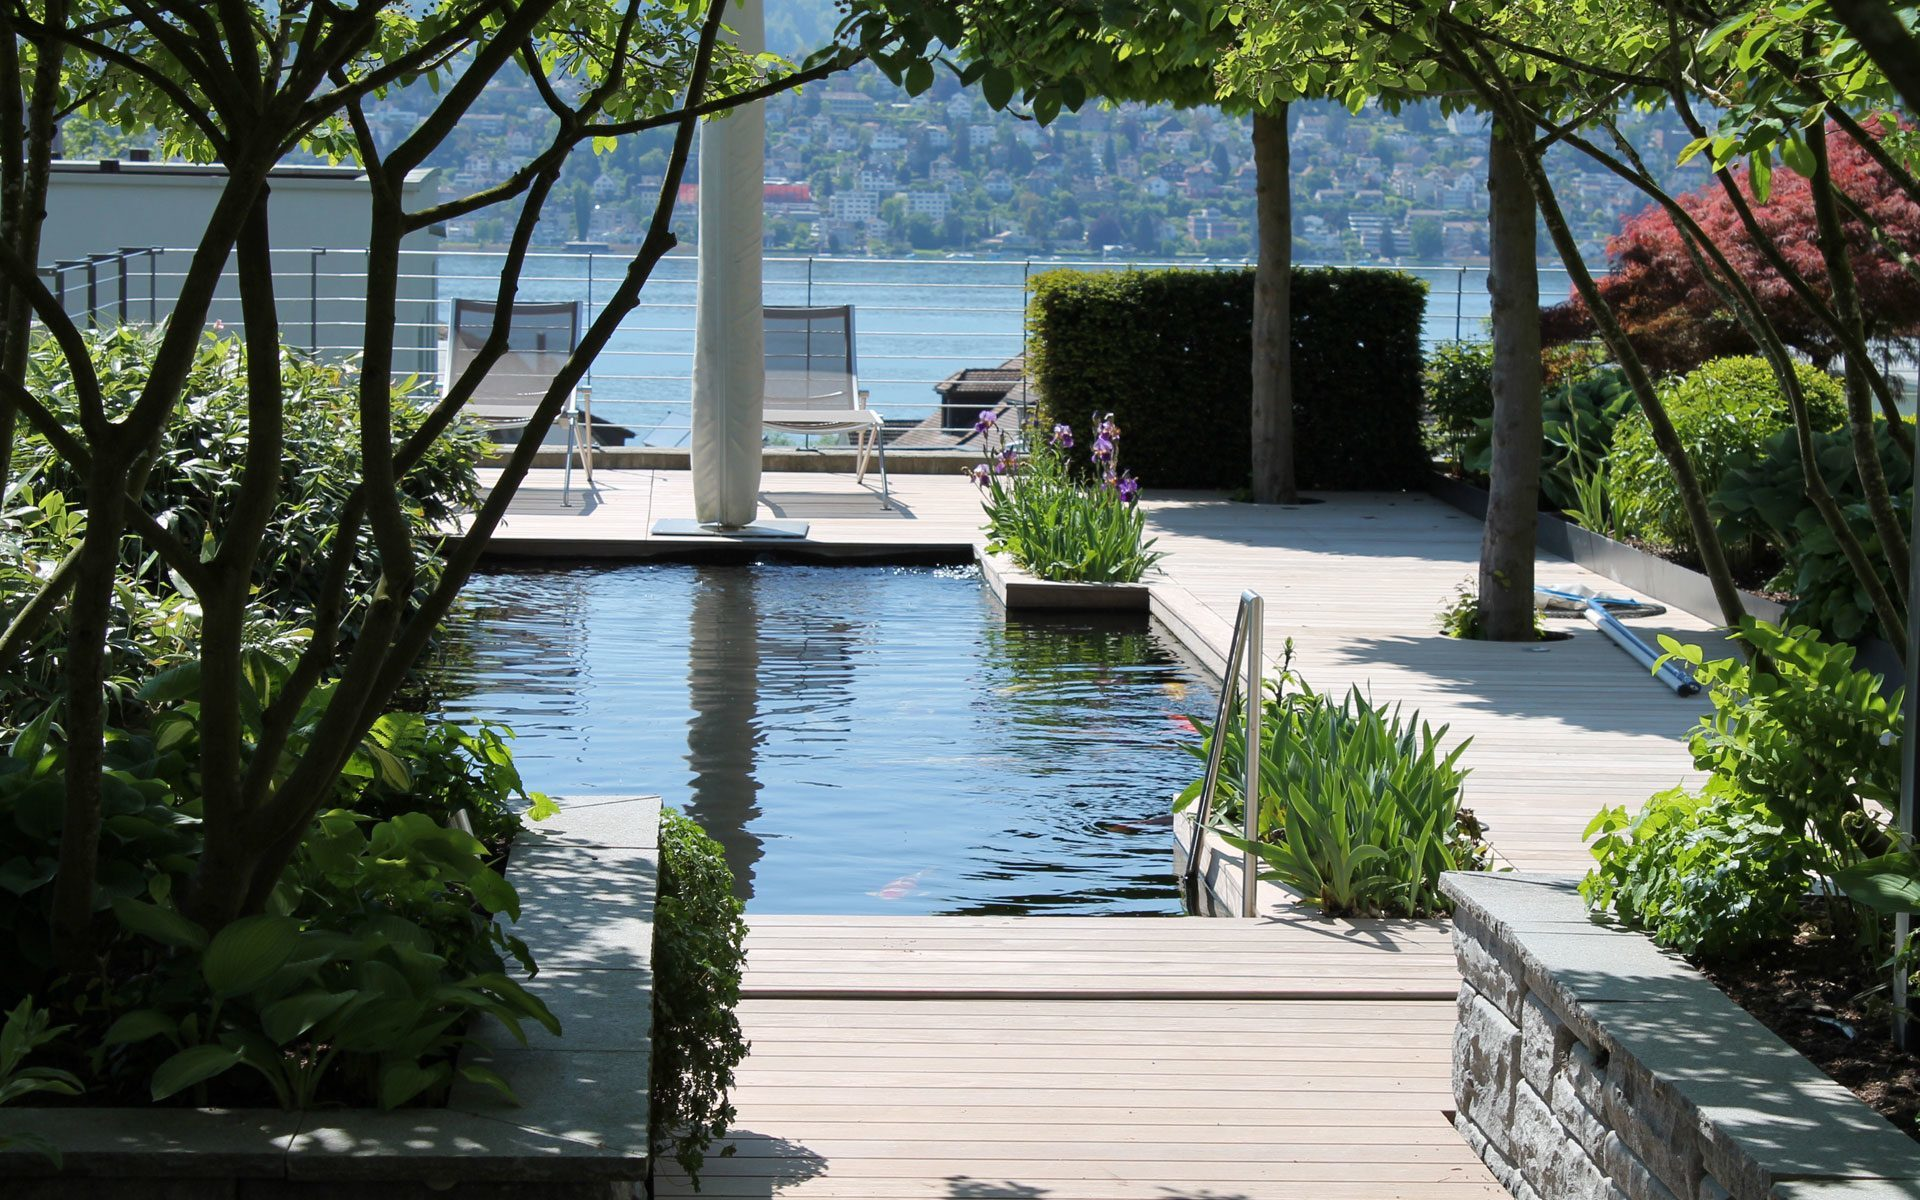 Emejing Landschaftsarchitektur Garten Skizze Gallery - New Home ...